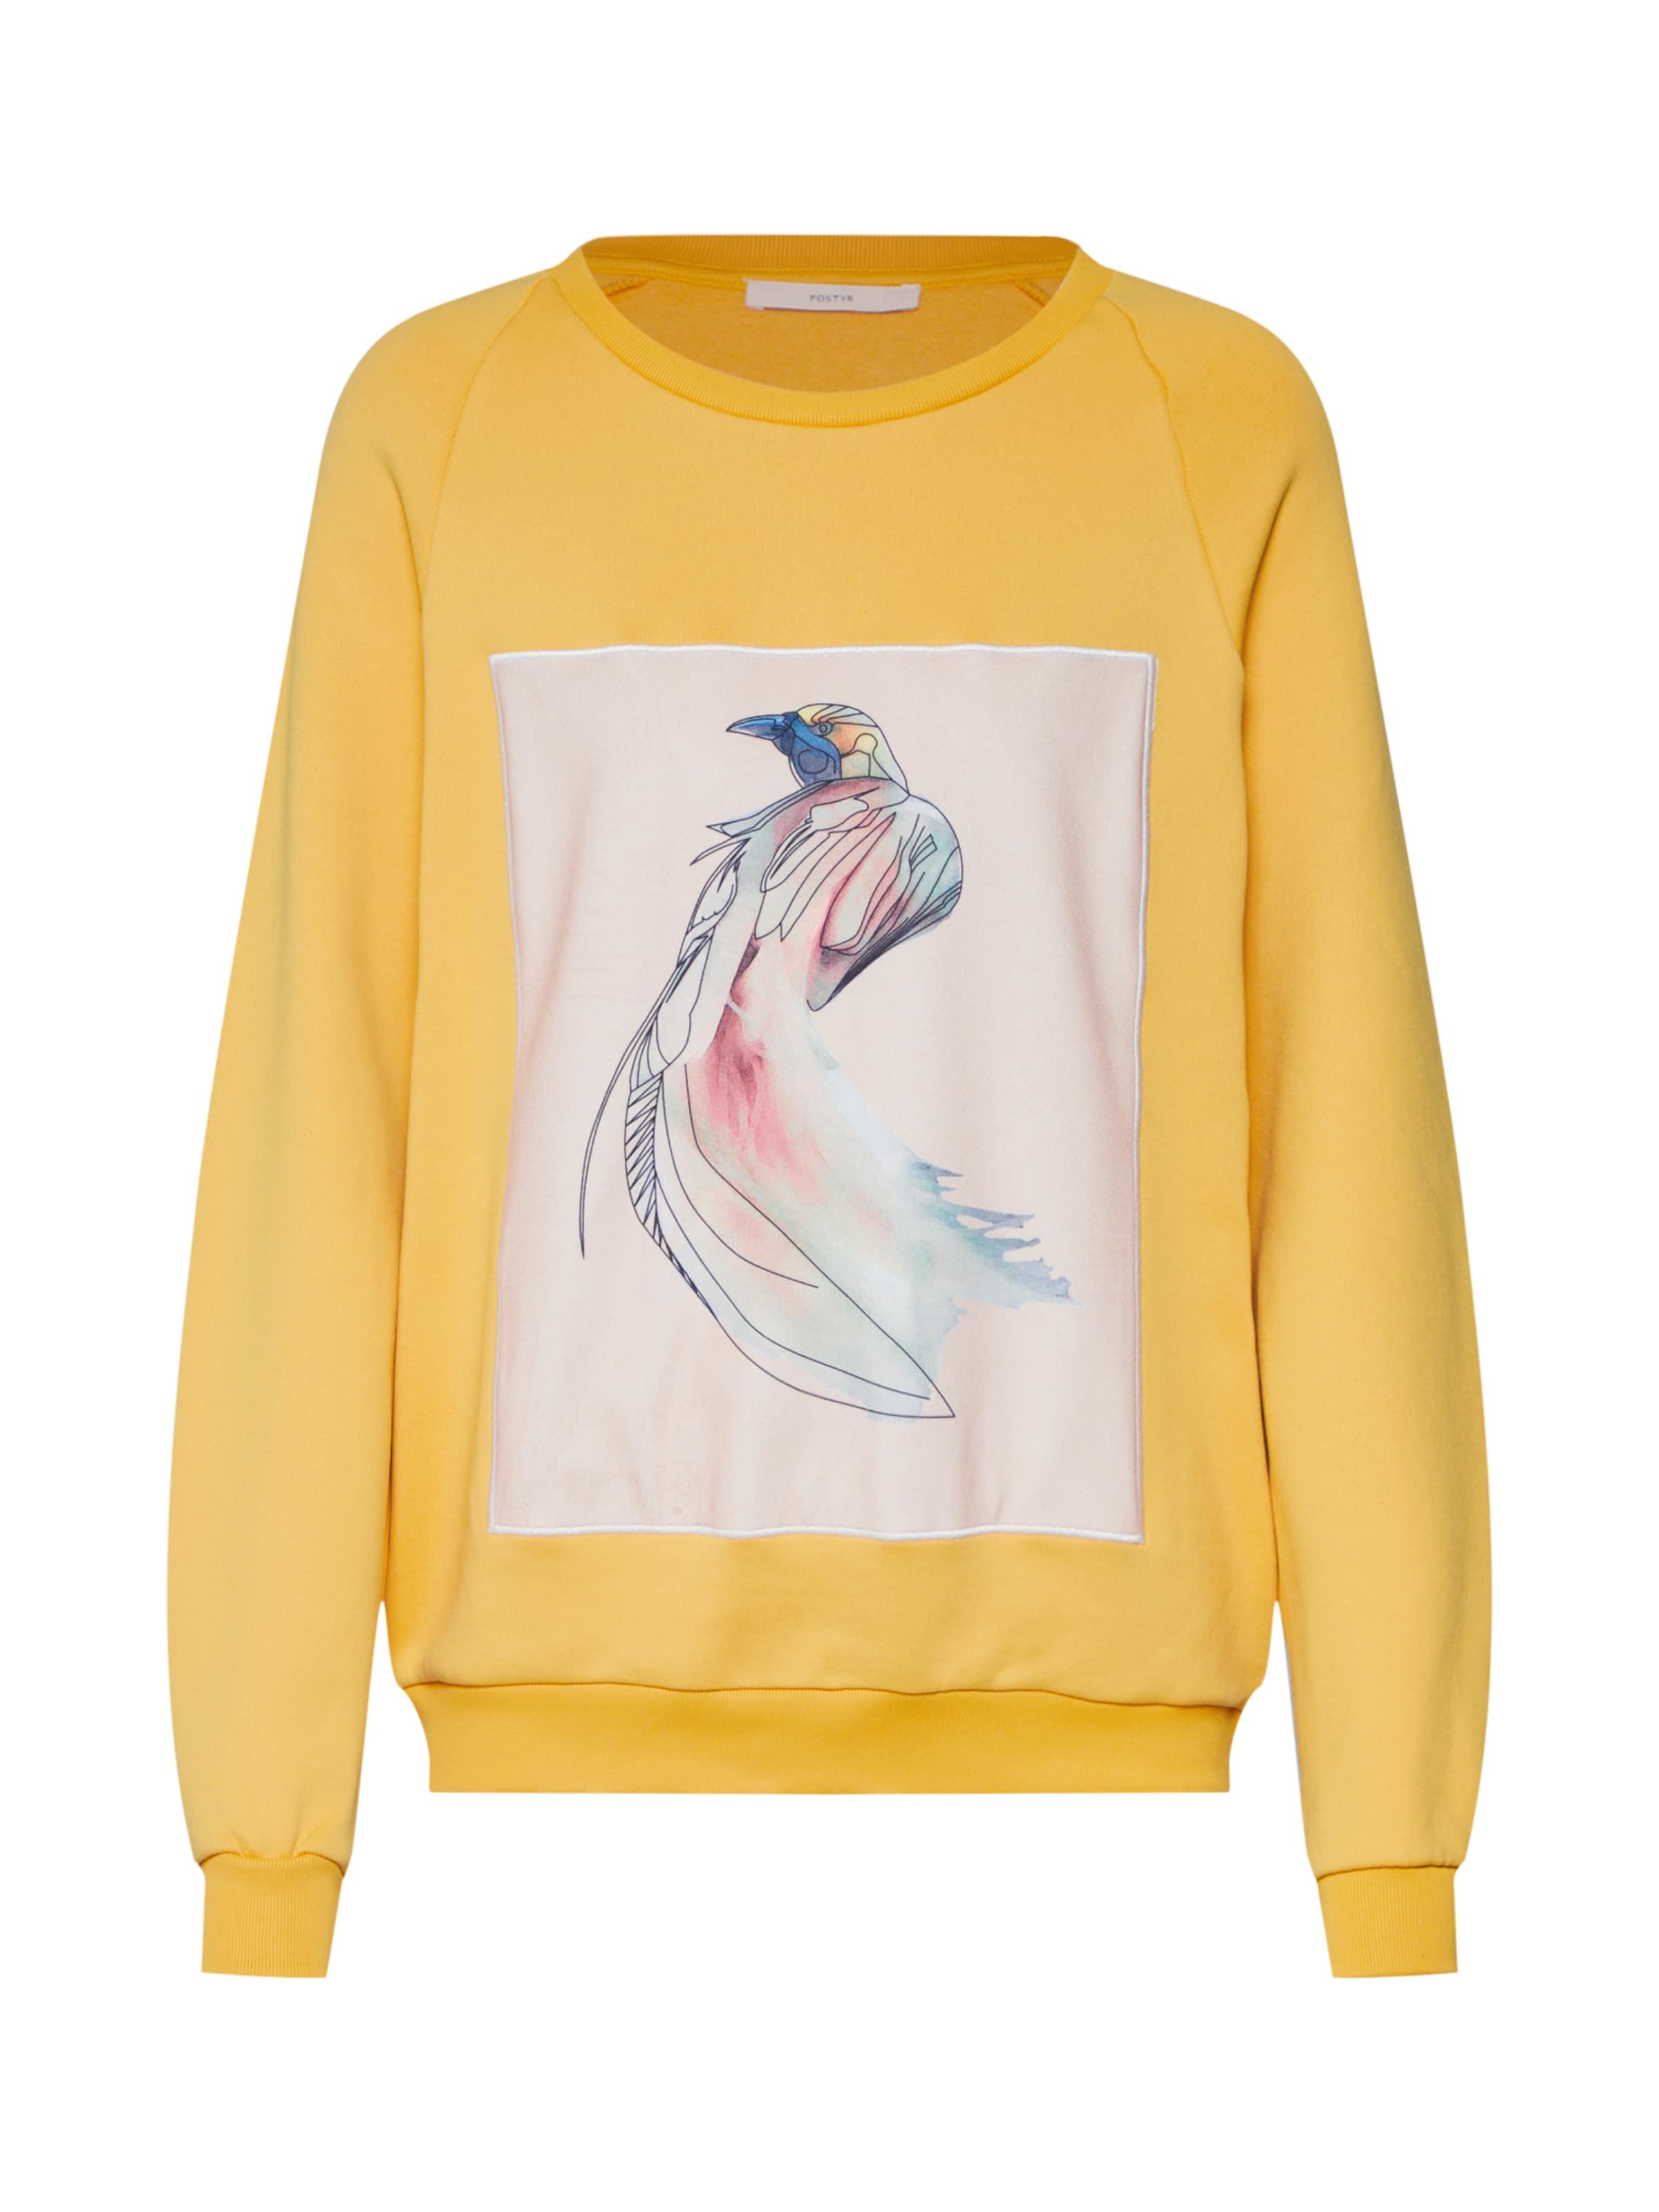 'posirene JauneBlanc Sweat Postyr Bird Sweat' shirt En Yyvbf7g6